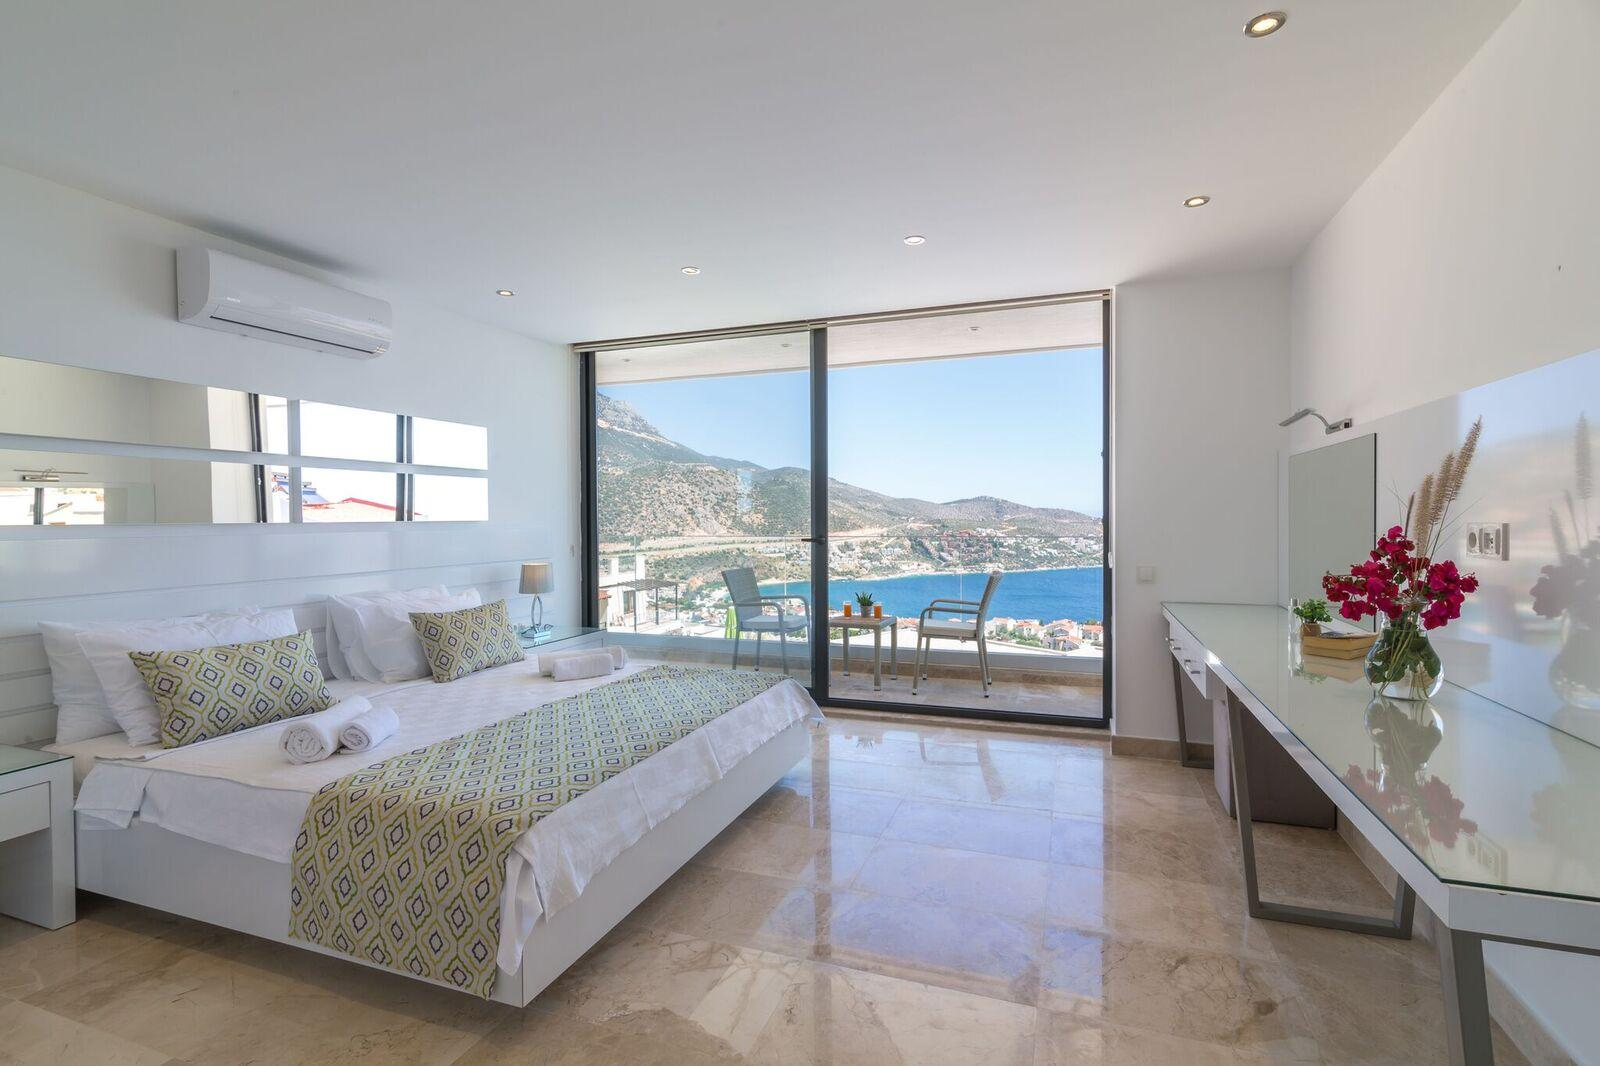 Bedroom 4 - 1st Floor - Super Kingsize Bed with double shower ensuite